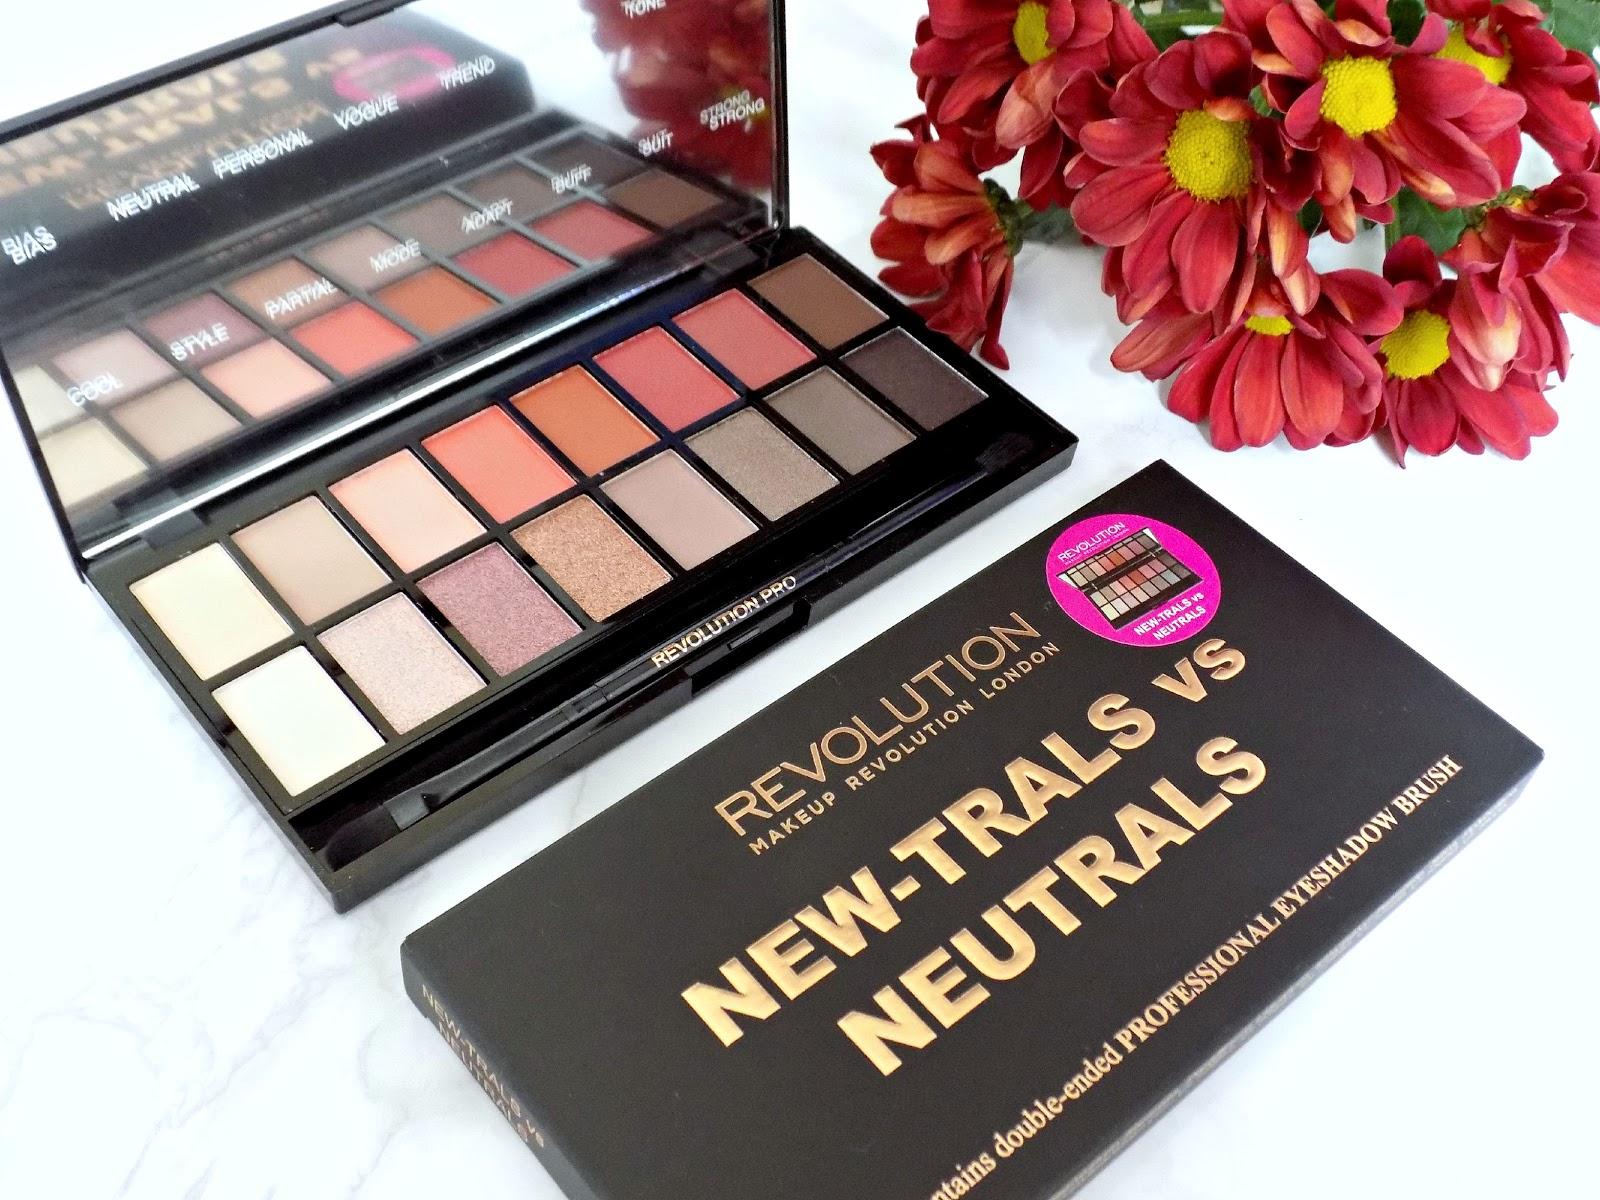 Makeup Revolution New Trals Vs Neutrals Palette Review